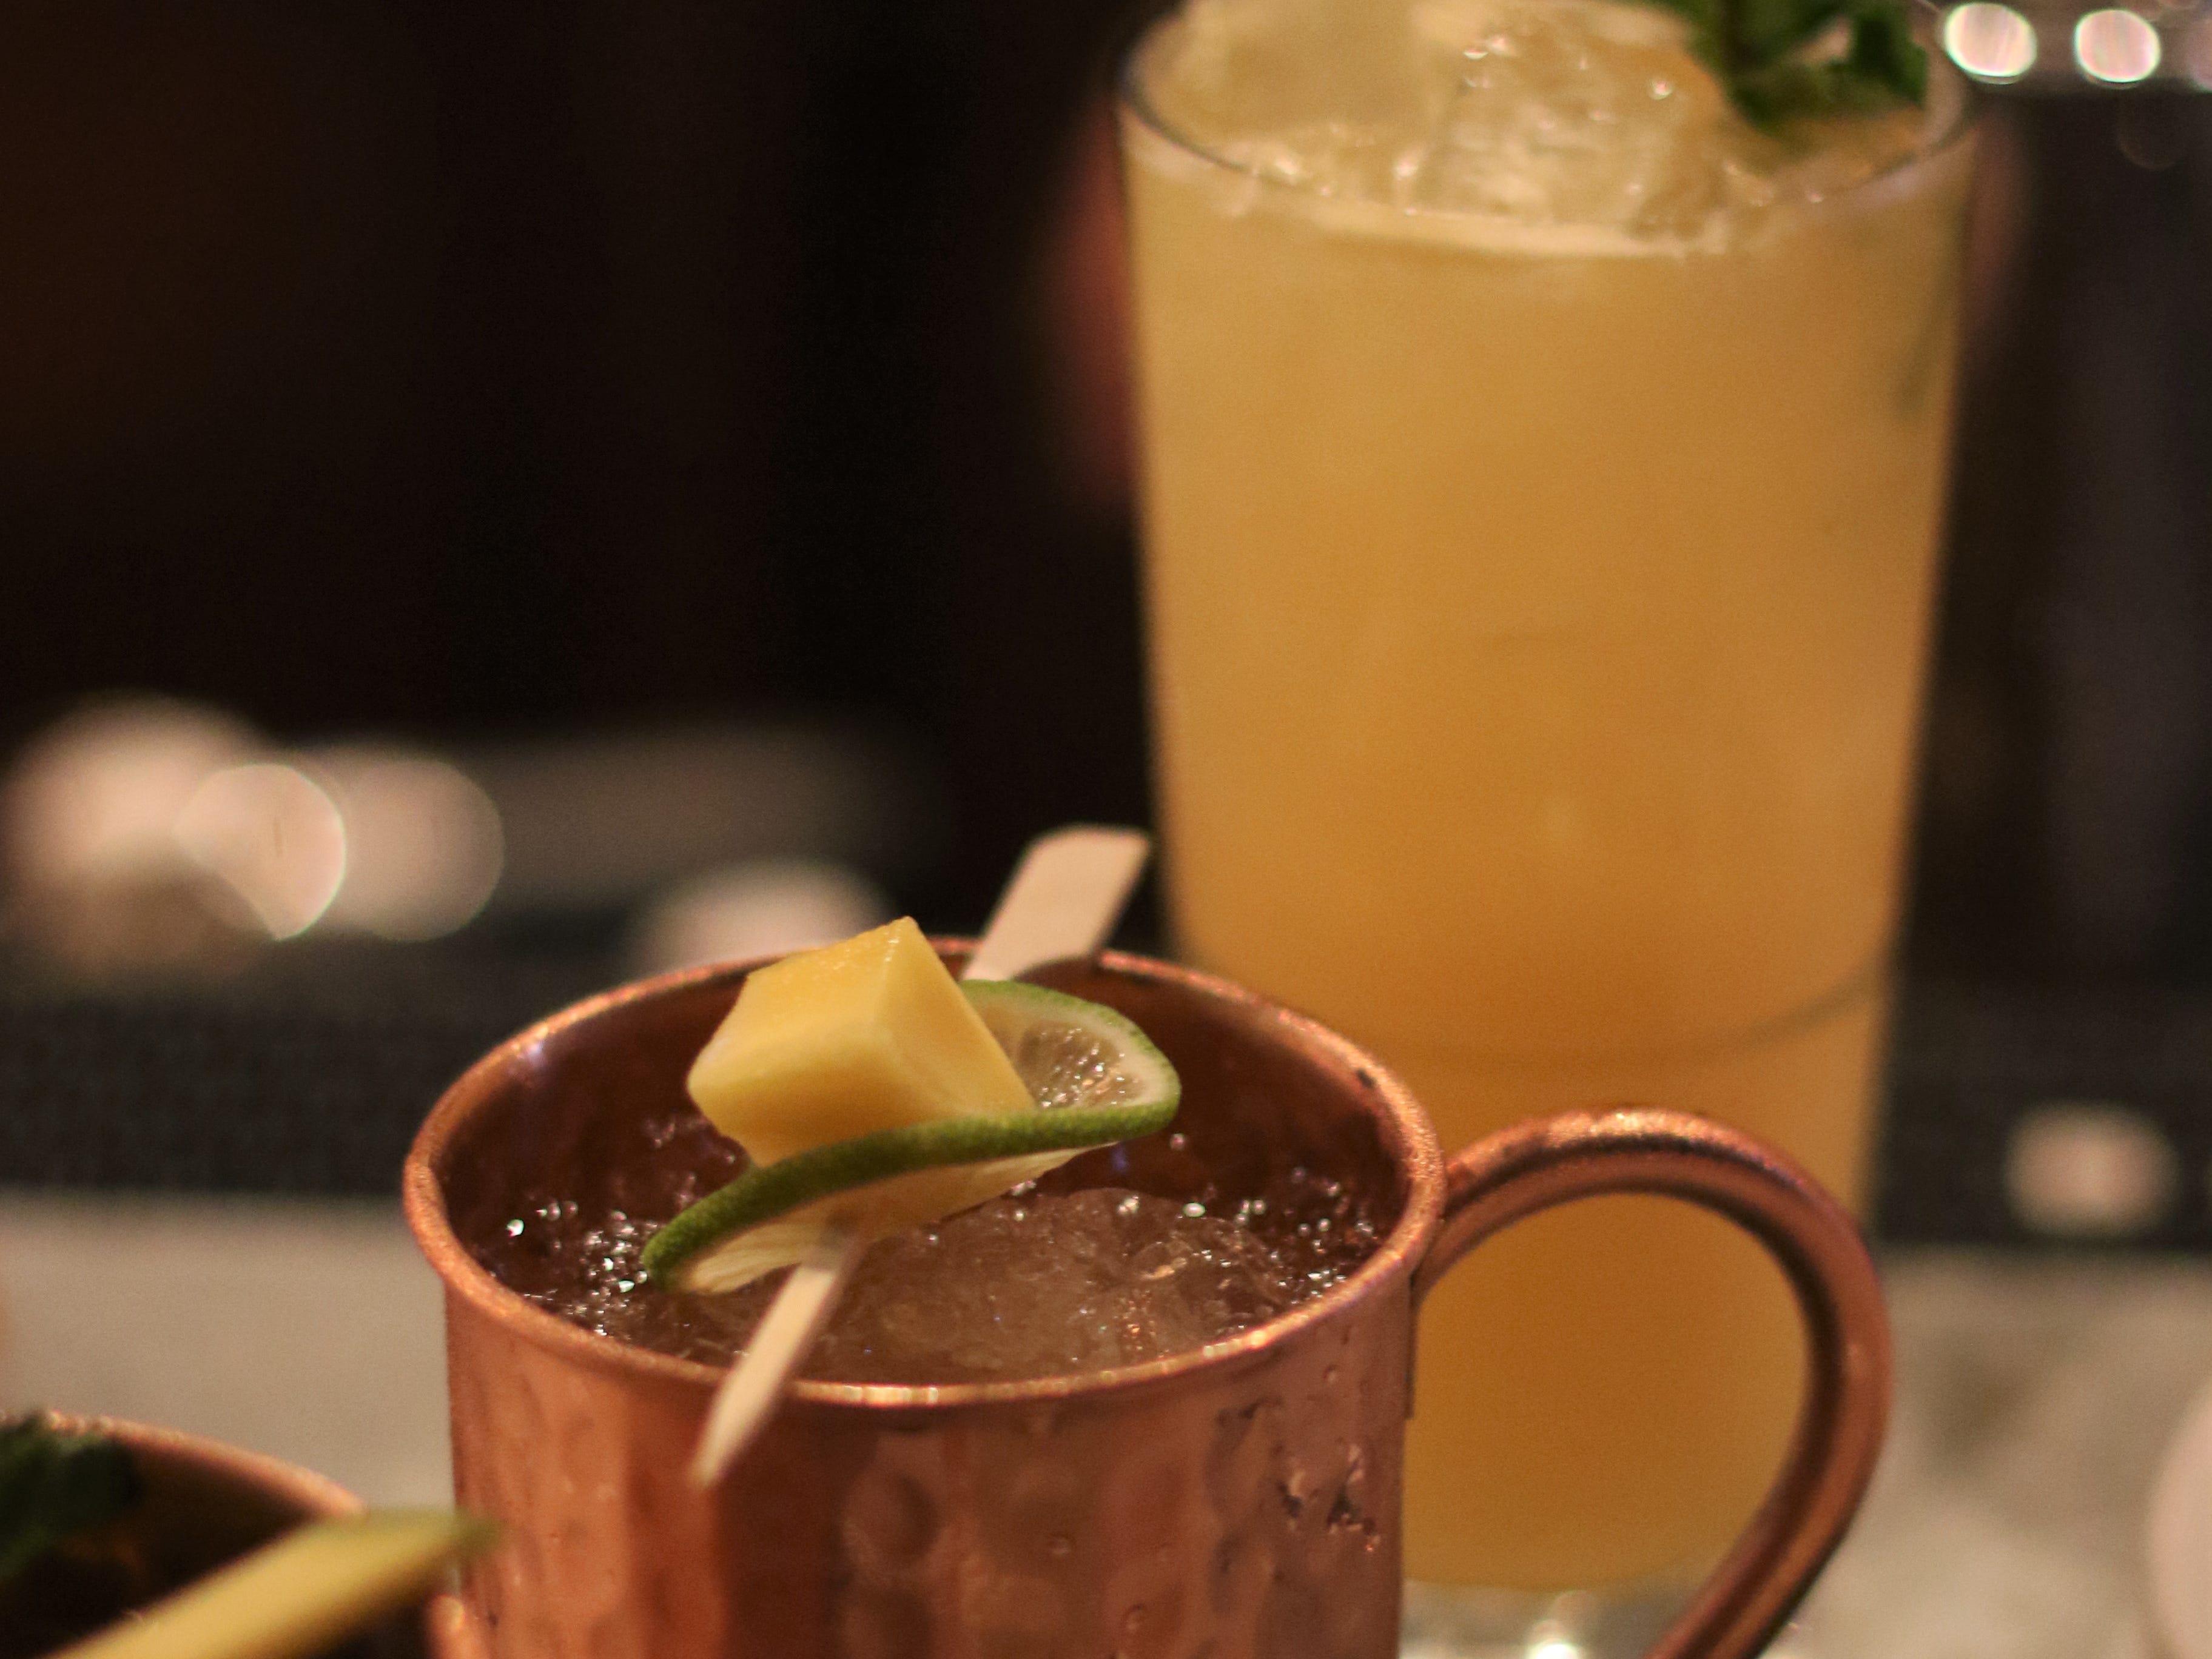 A round of competition cocktails at Brutal Bar on Nov. 5, 2019.